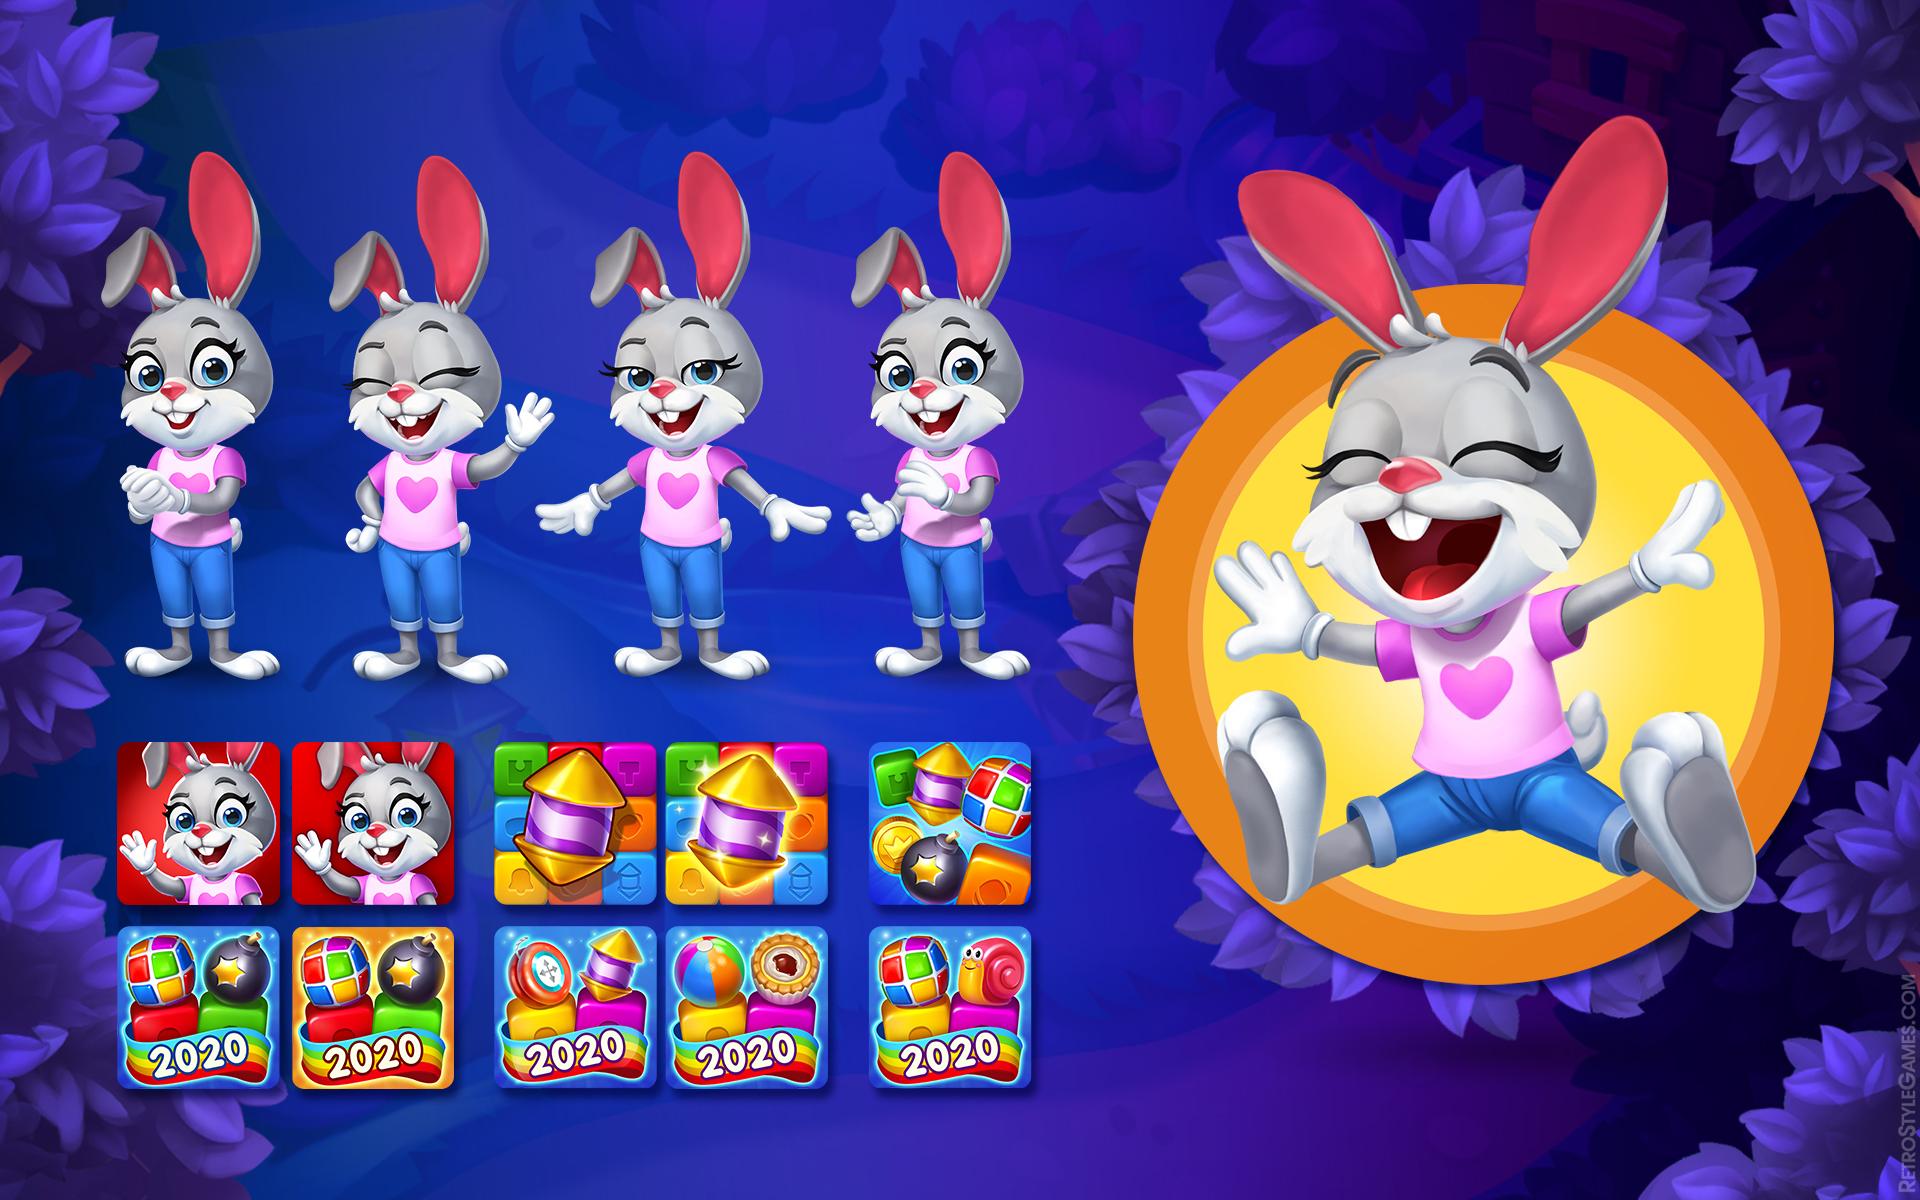 Toy Character Rabbit Looney Tunes App Icon Variants